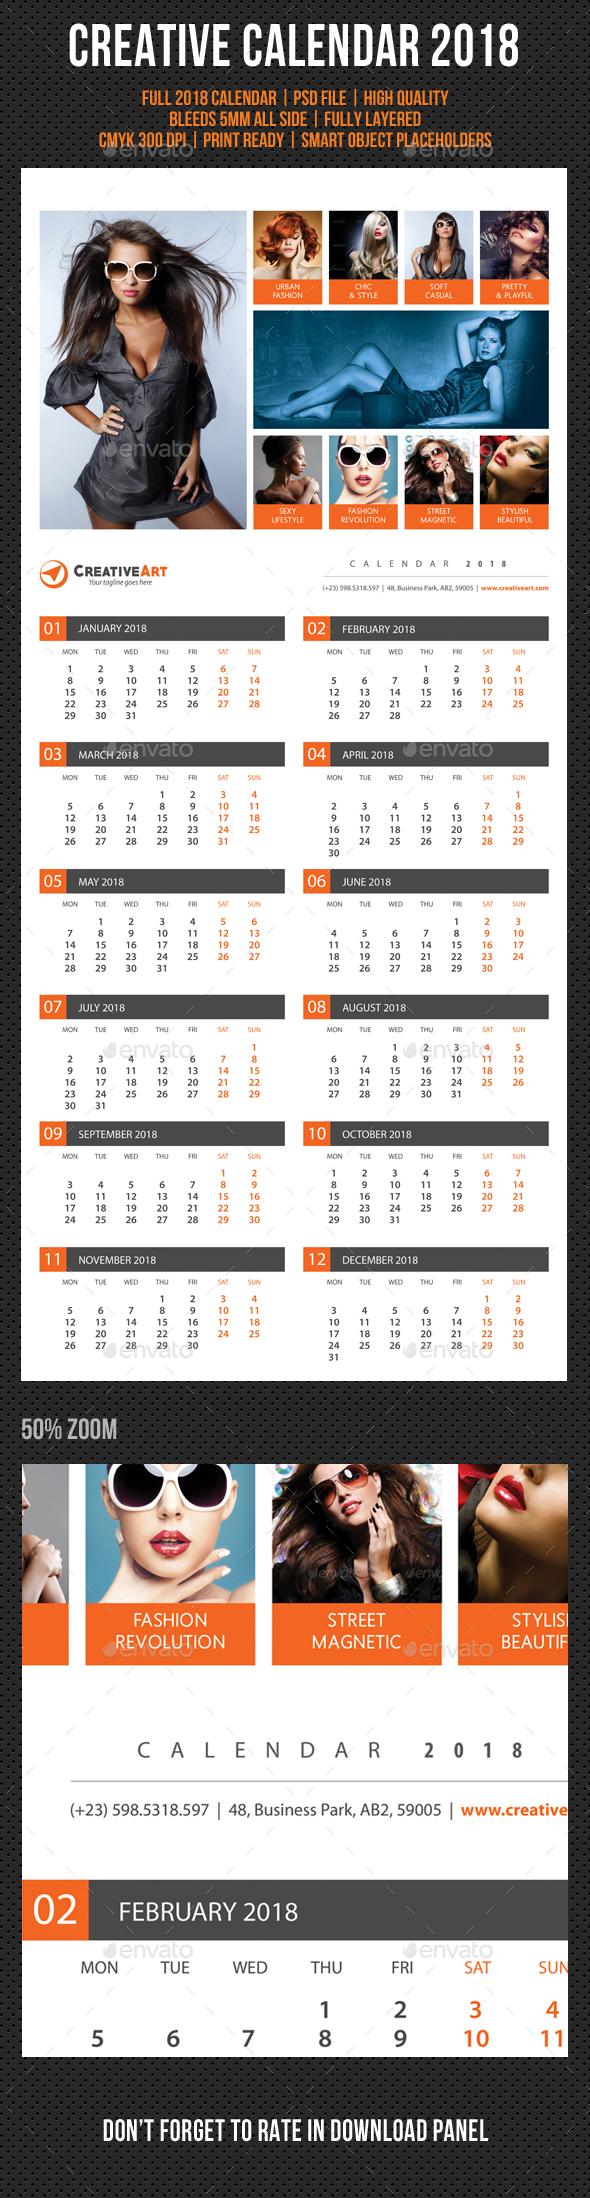 Creative Wall Calendar 2018 V02 - Calendars Stationery